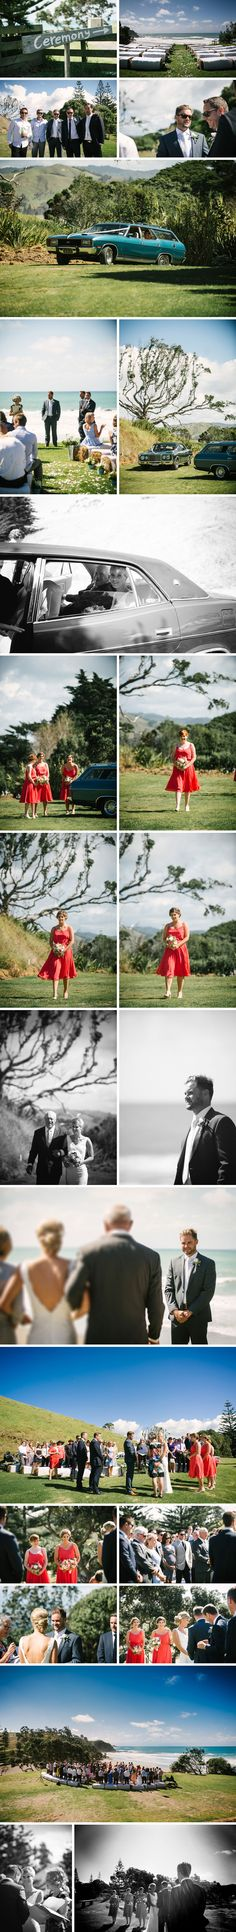 Exposure Photographics_Tim_Kylie3